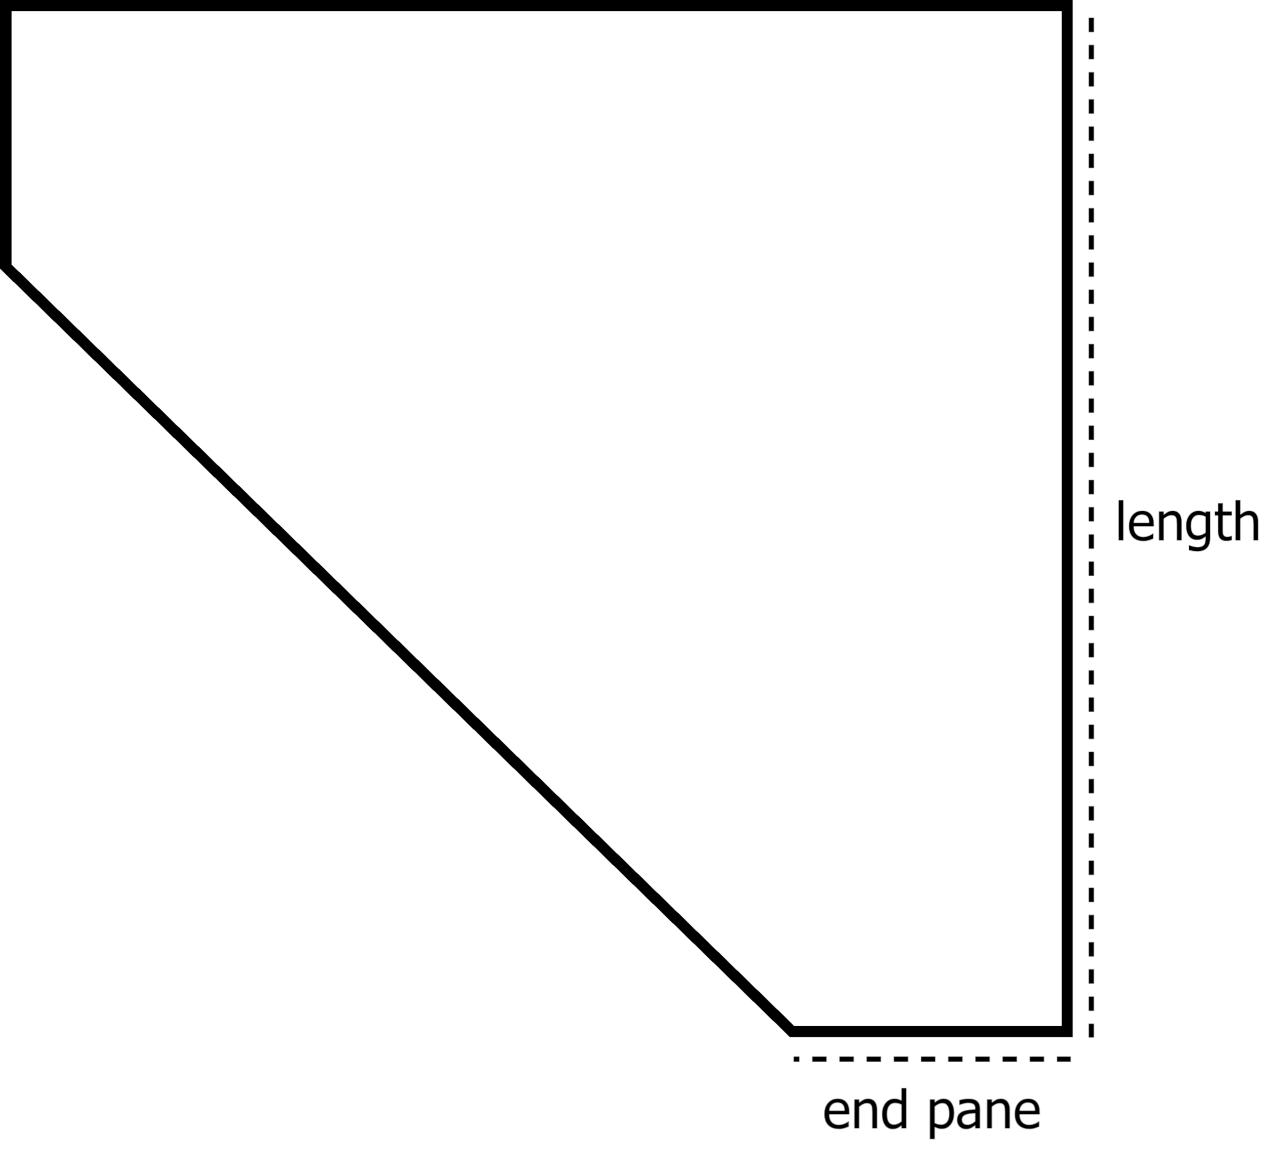 corner pentagon aquarium top view showing the length and end pane dimensions